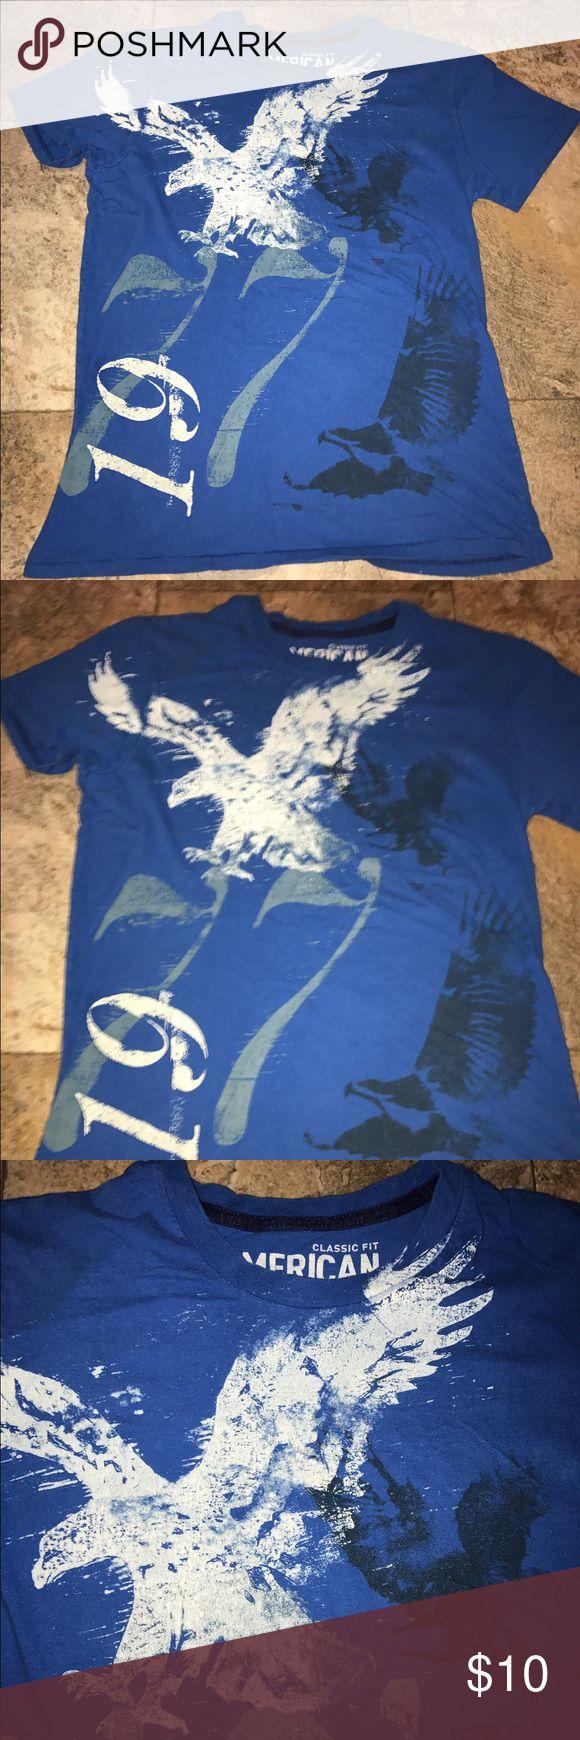 American eagle men's t shirt xsmall EUC American eagle men's t shirt xsmall EUC American Eagle Outfitters Shirts Tees - Short Sleeve